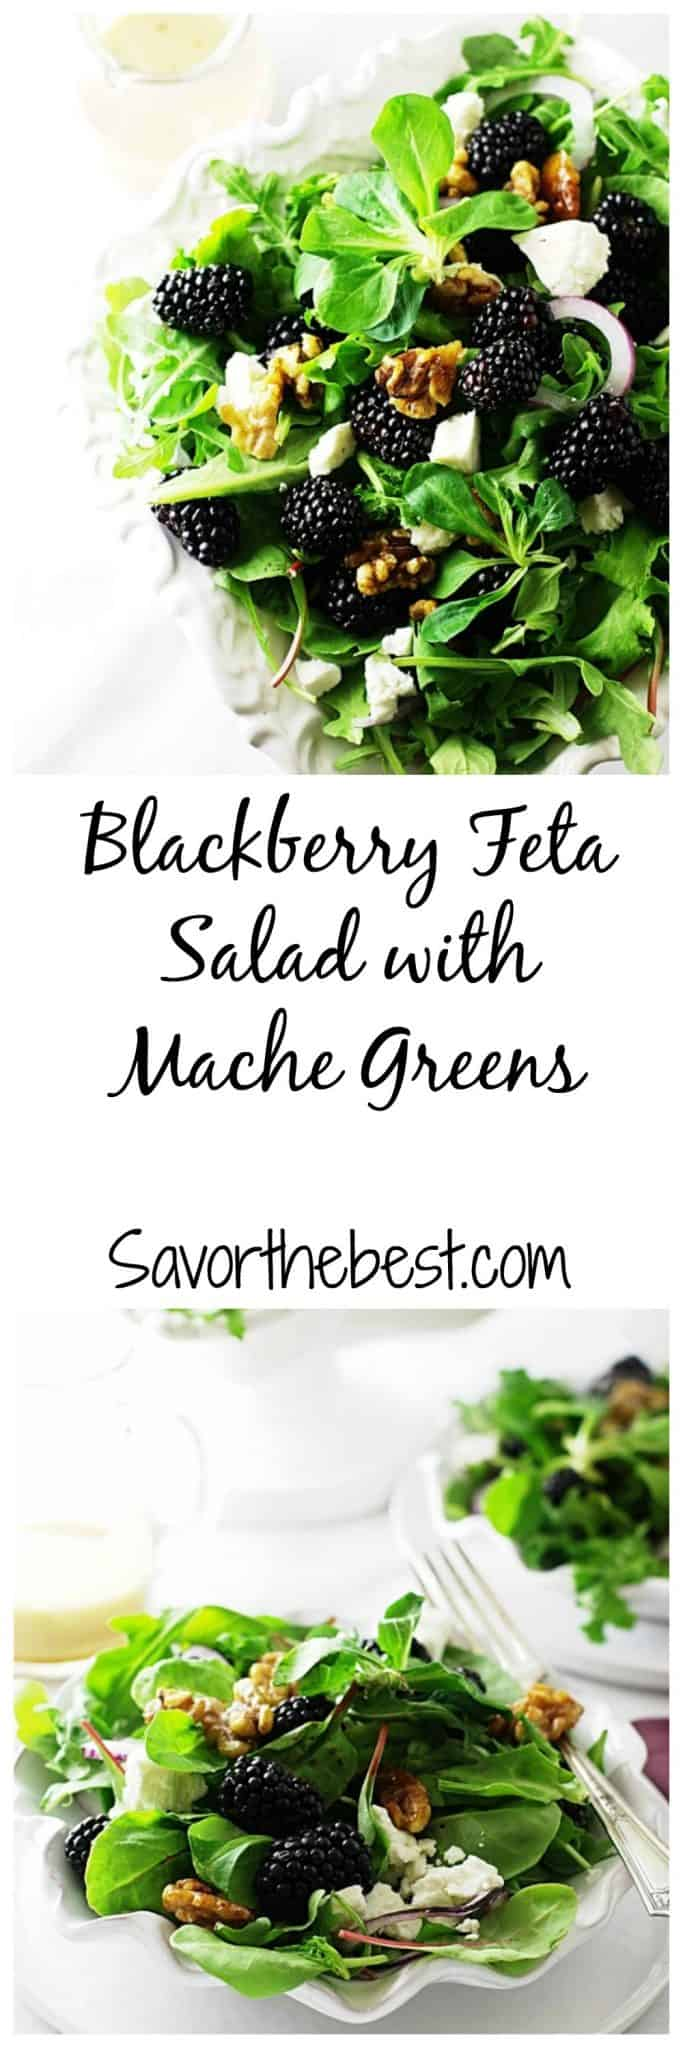 blackberry feta salad with mache greens